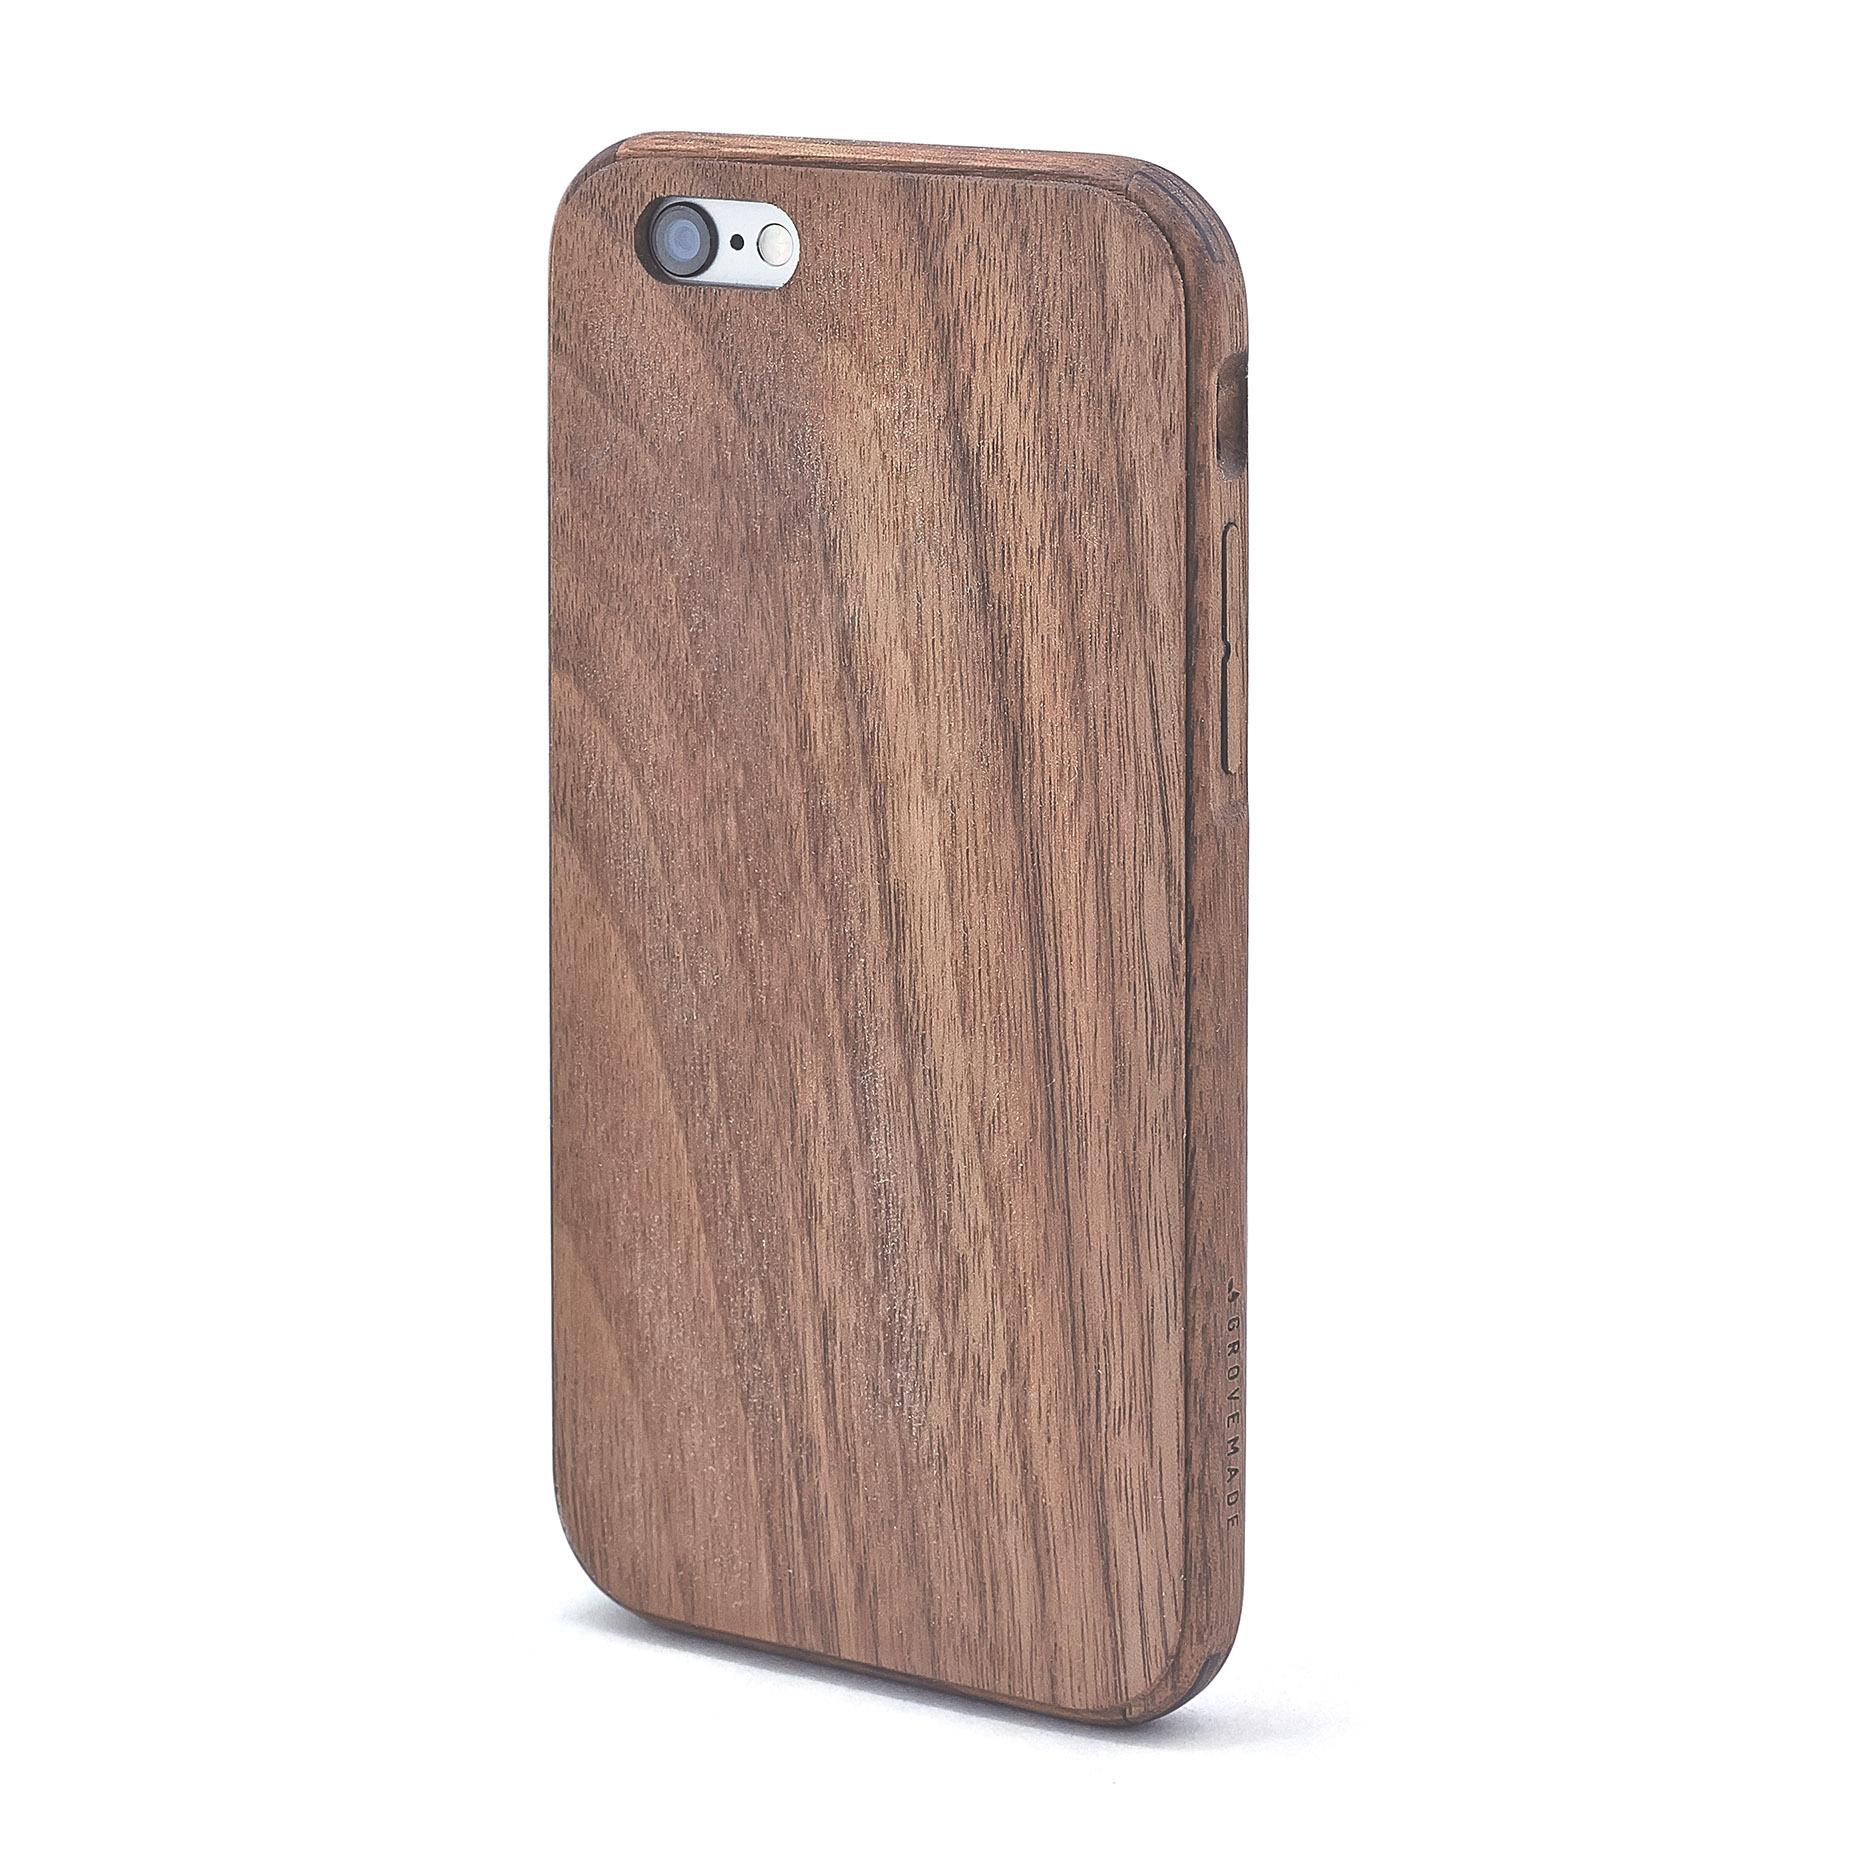 Wood iPhone 7 Case u0026 SE/6/6S/Plus in Walnut by Grovemade